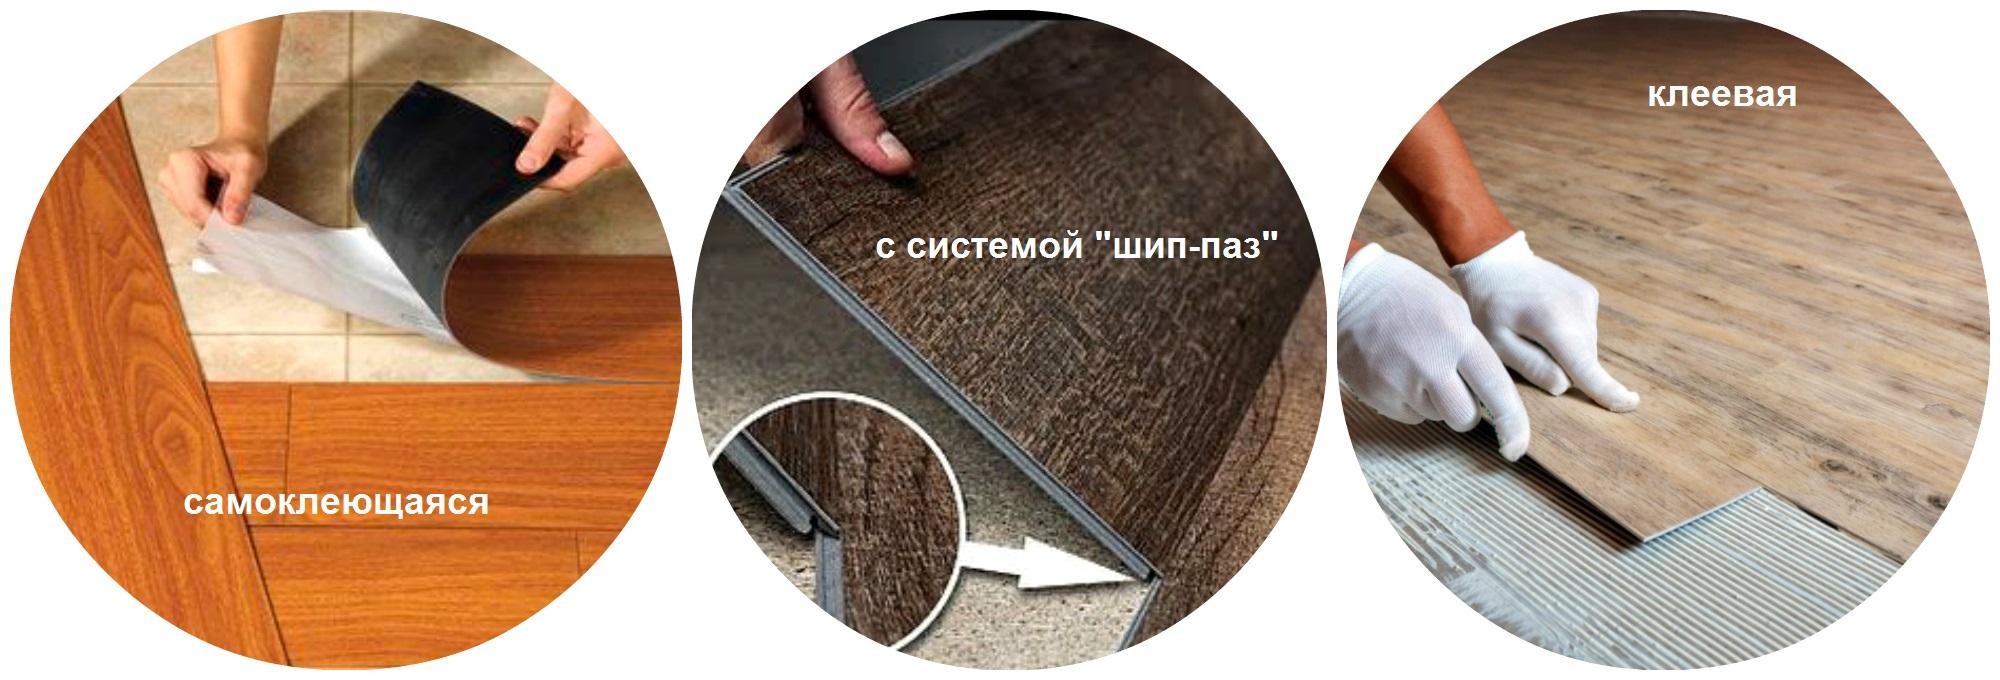 способ укладки плитки